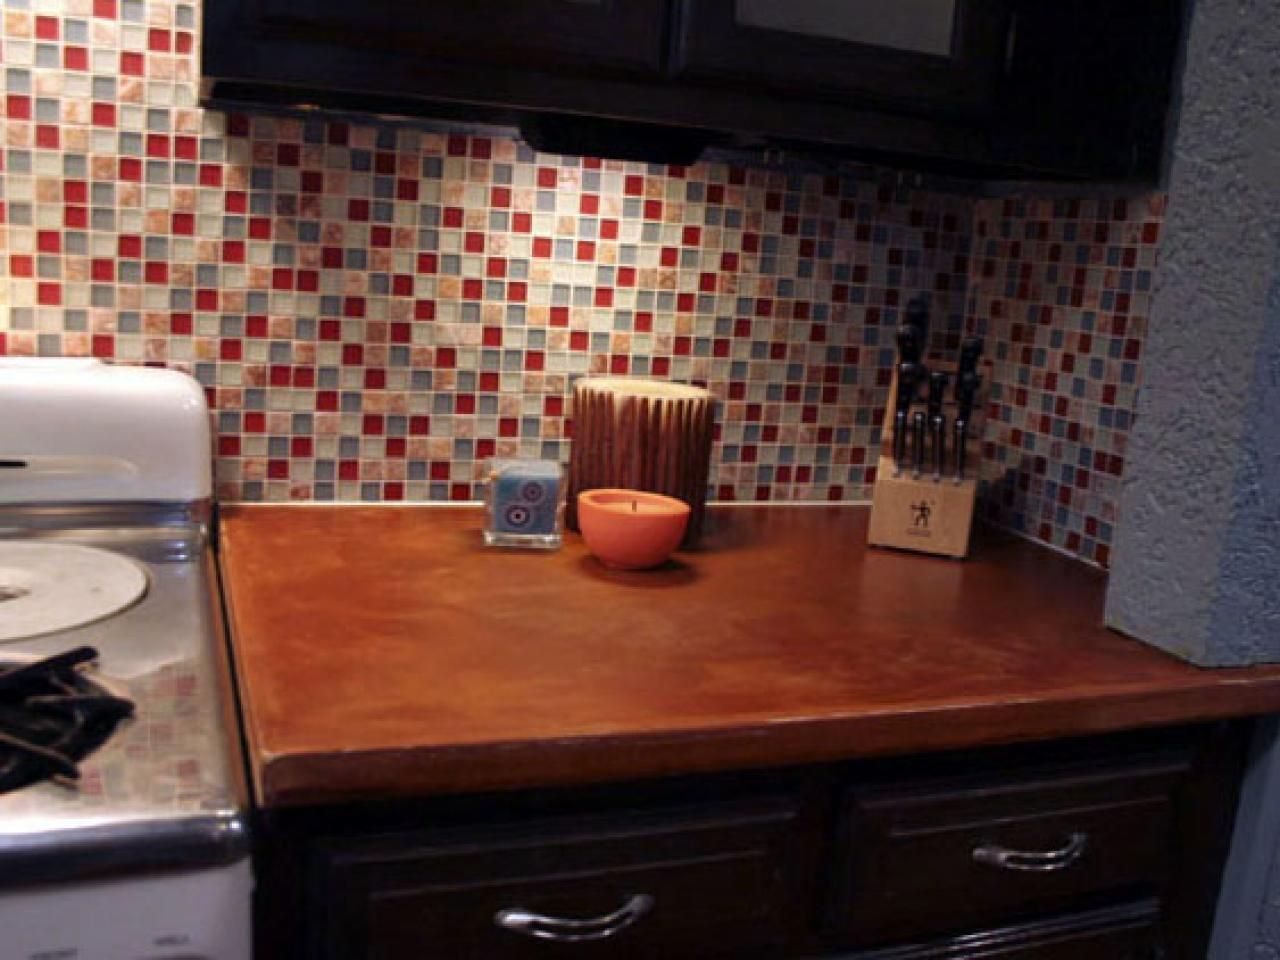 Installing Tile Backsplash Your Kitchen Hgtv How Install You Subway